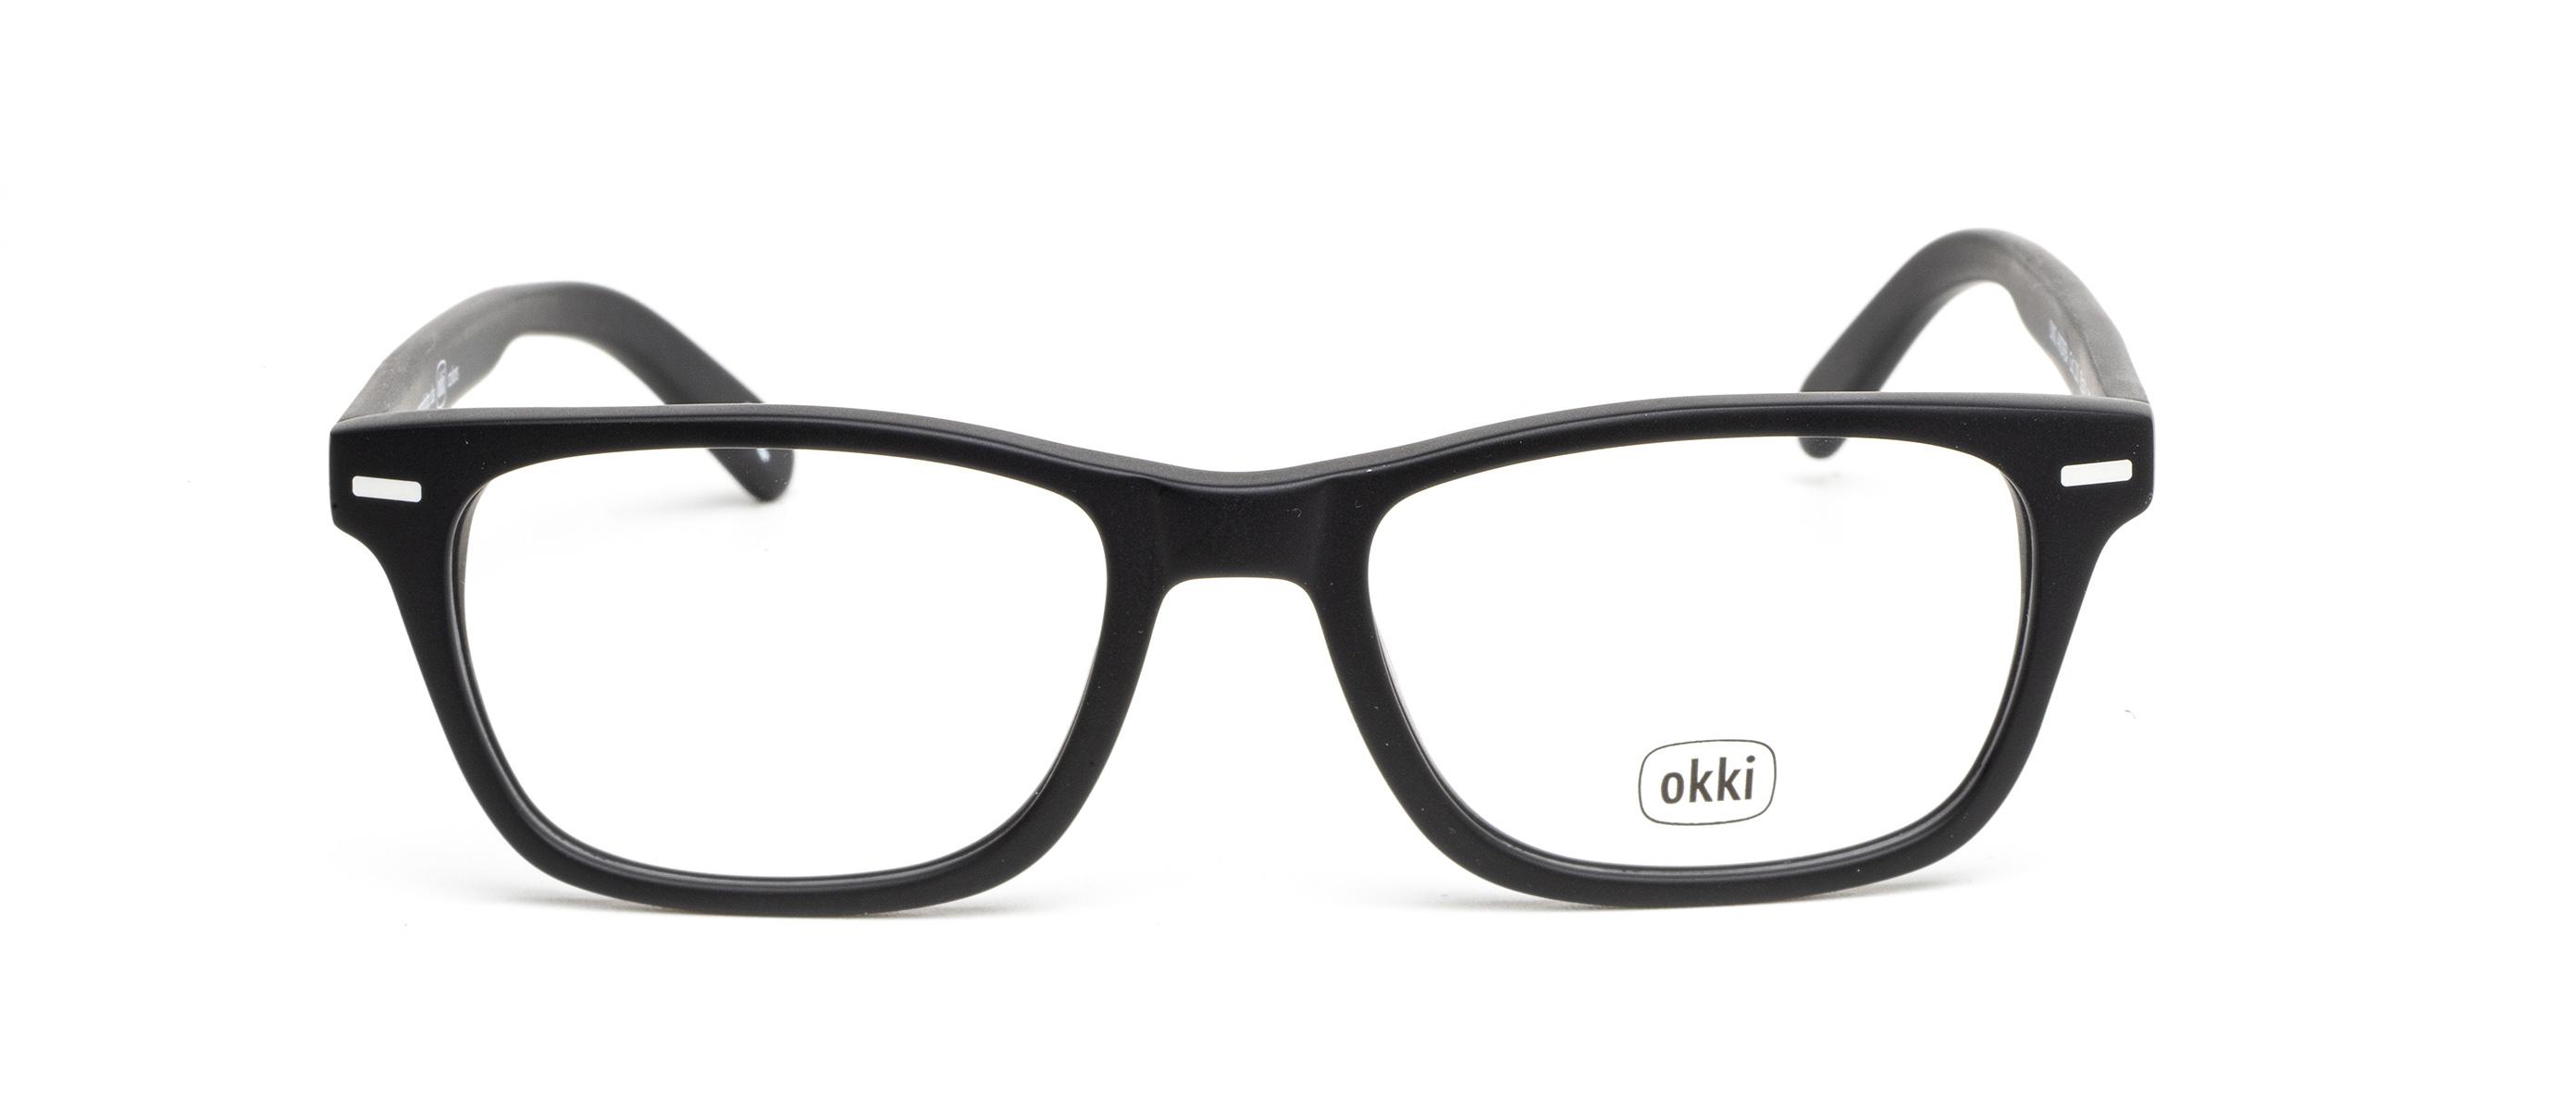 OKKI ANDREA - Montatura per Occhiali OKKI Colors